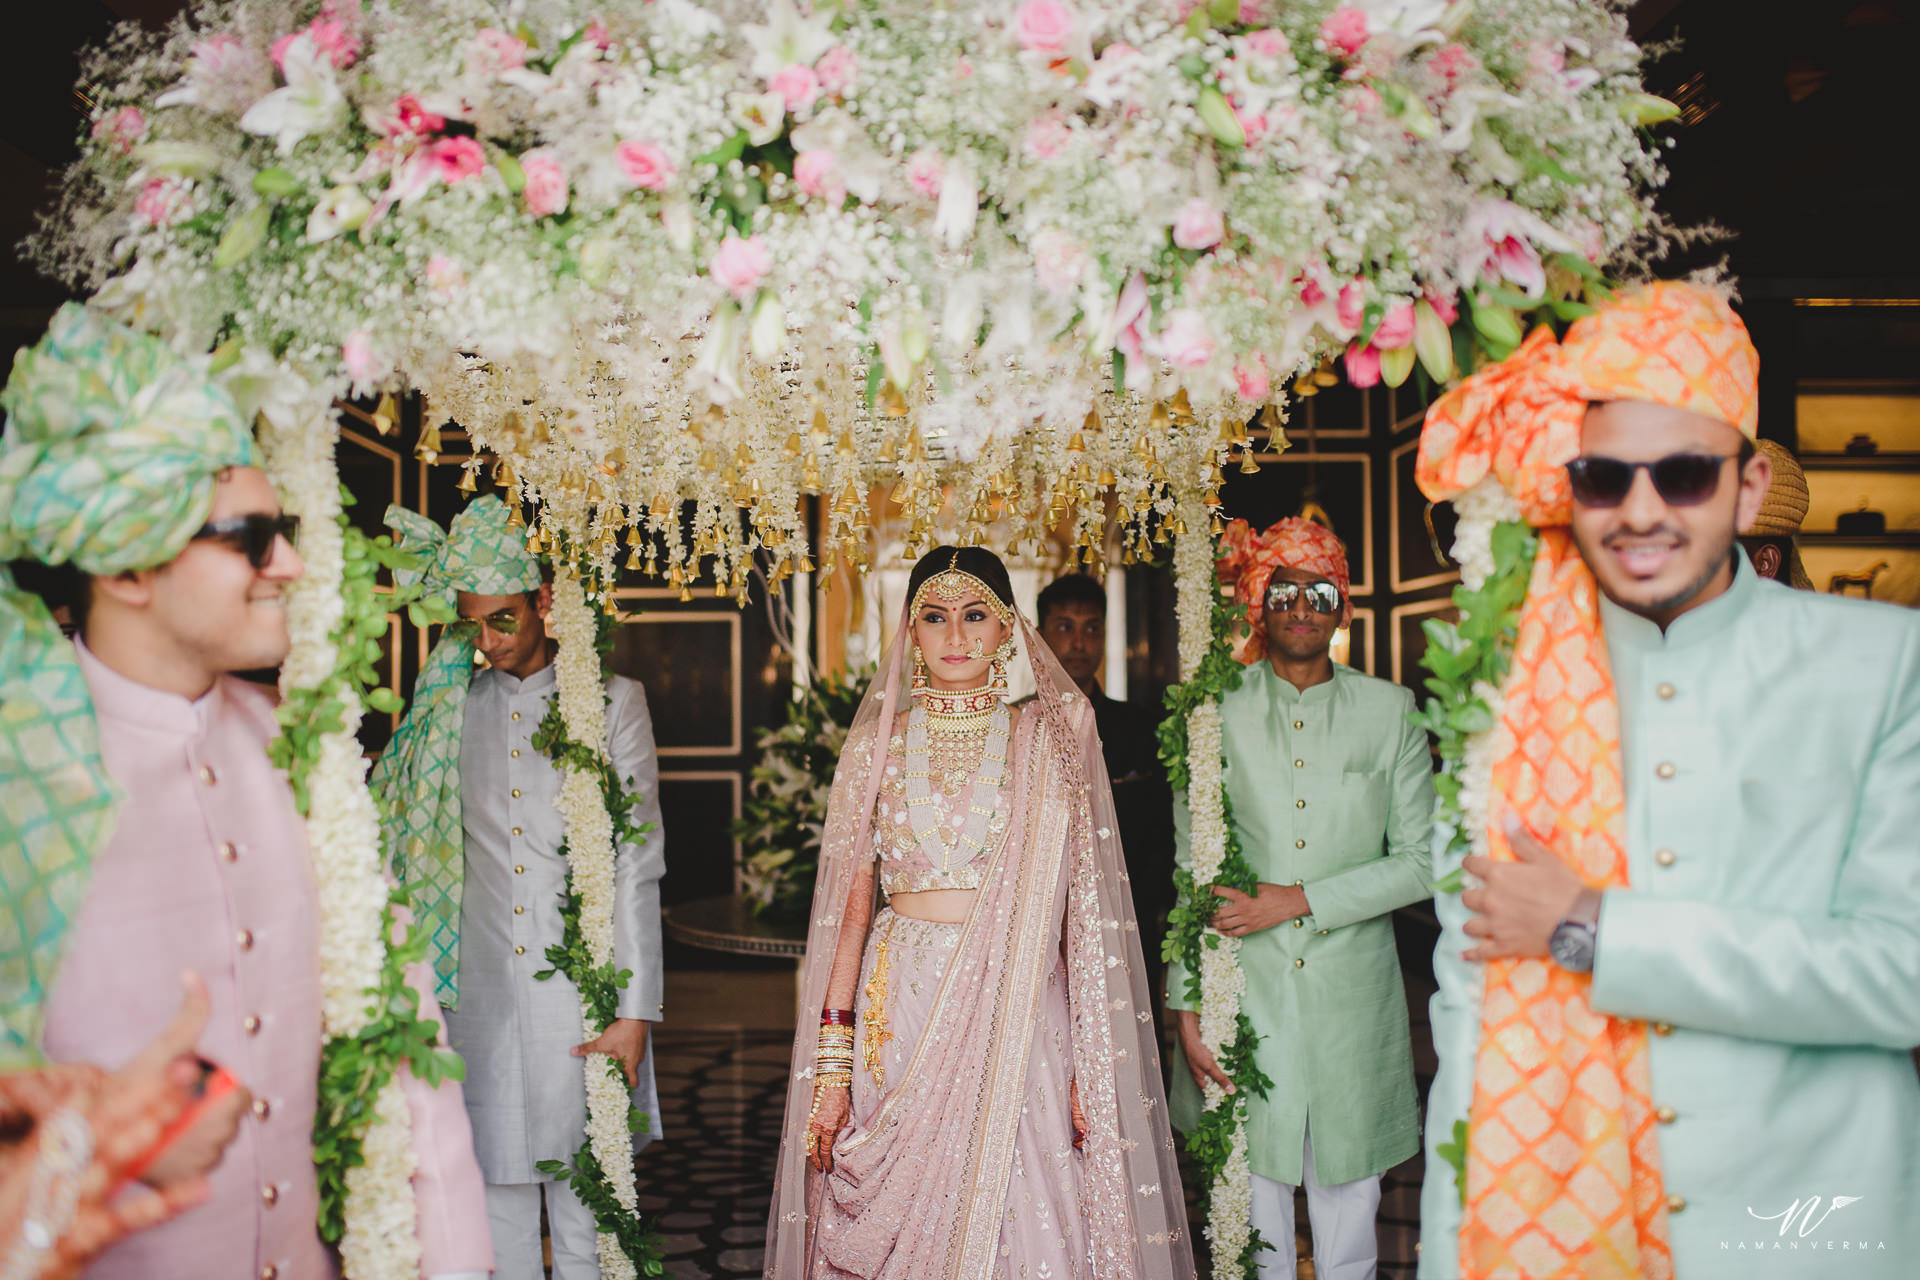 NVP_Vidhi&Rushang_Wedding_466.jpg